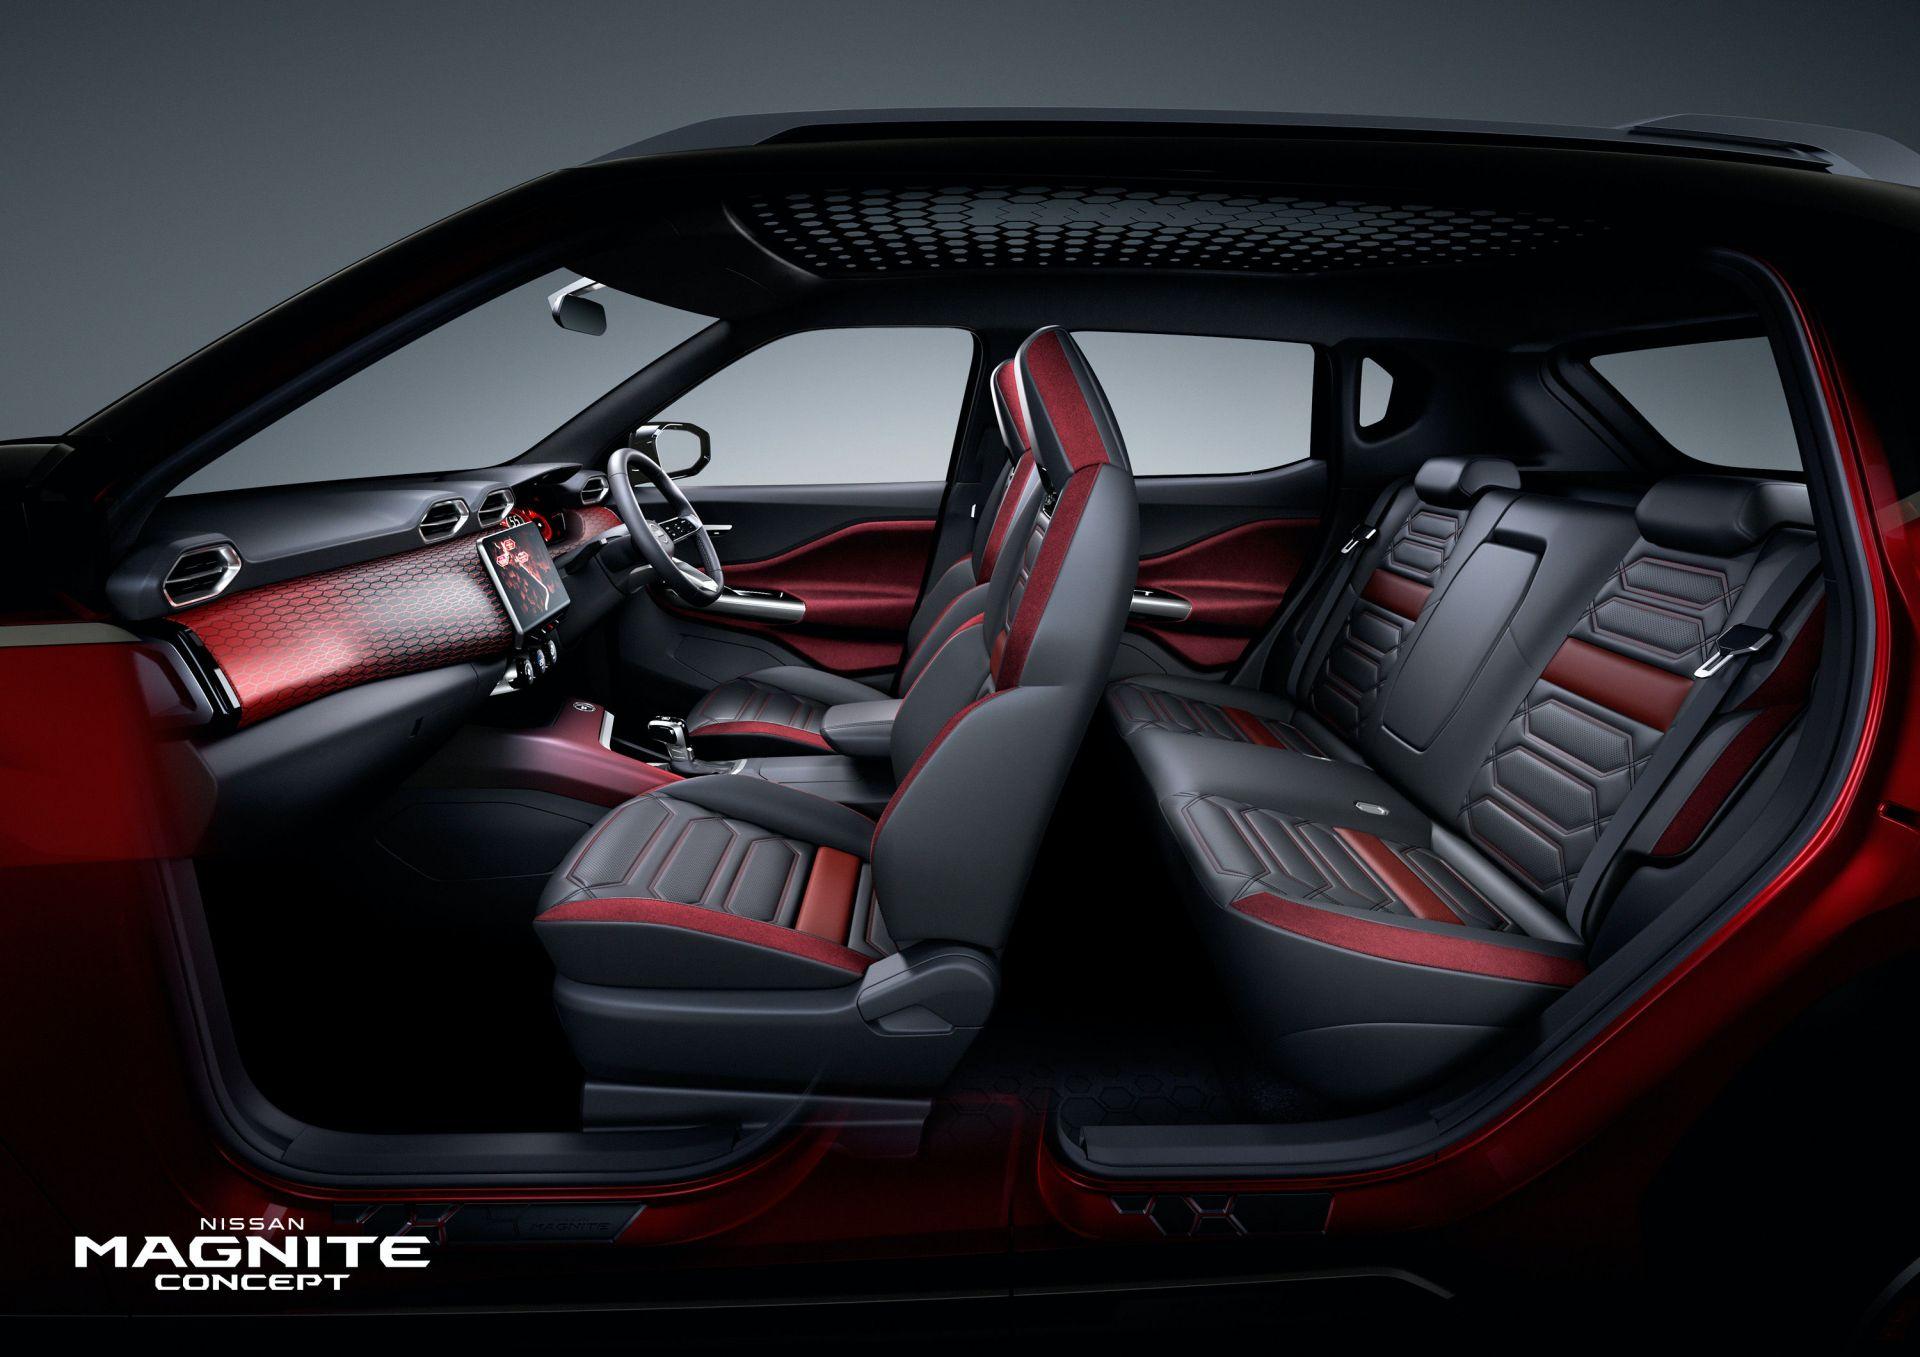 Nissan Magnite Concept interior 1 1